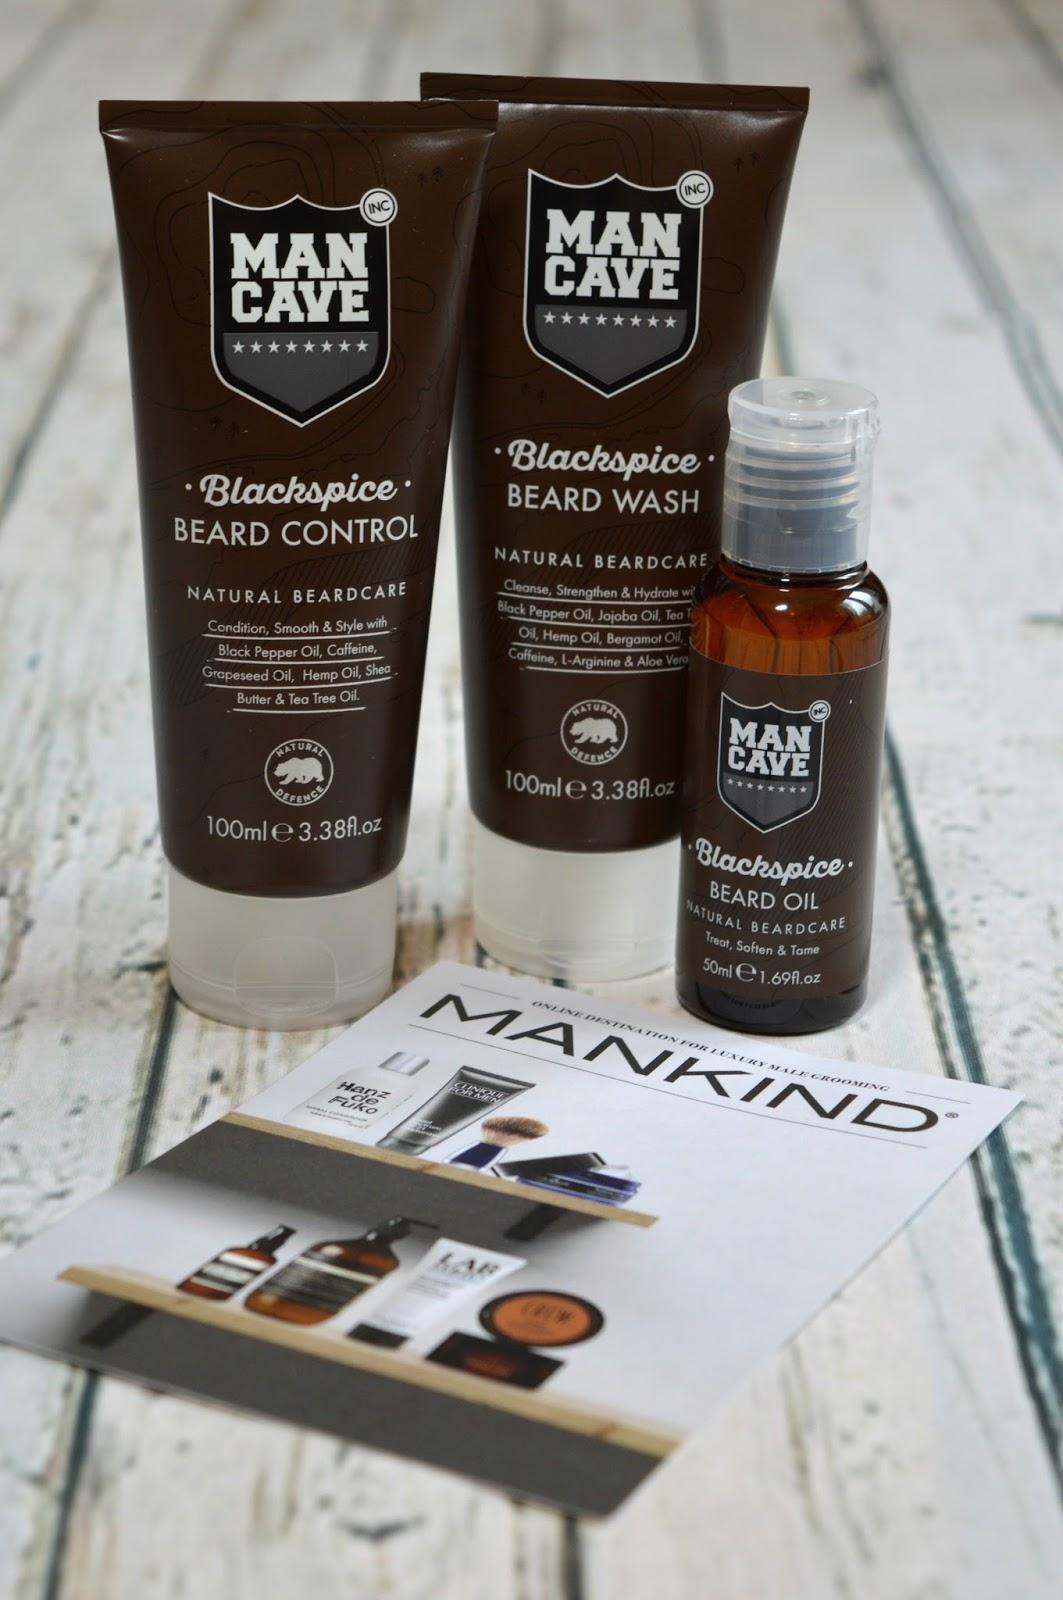 Man Cave Beard Oil : Off archives that dapper chap